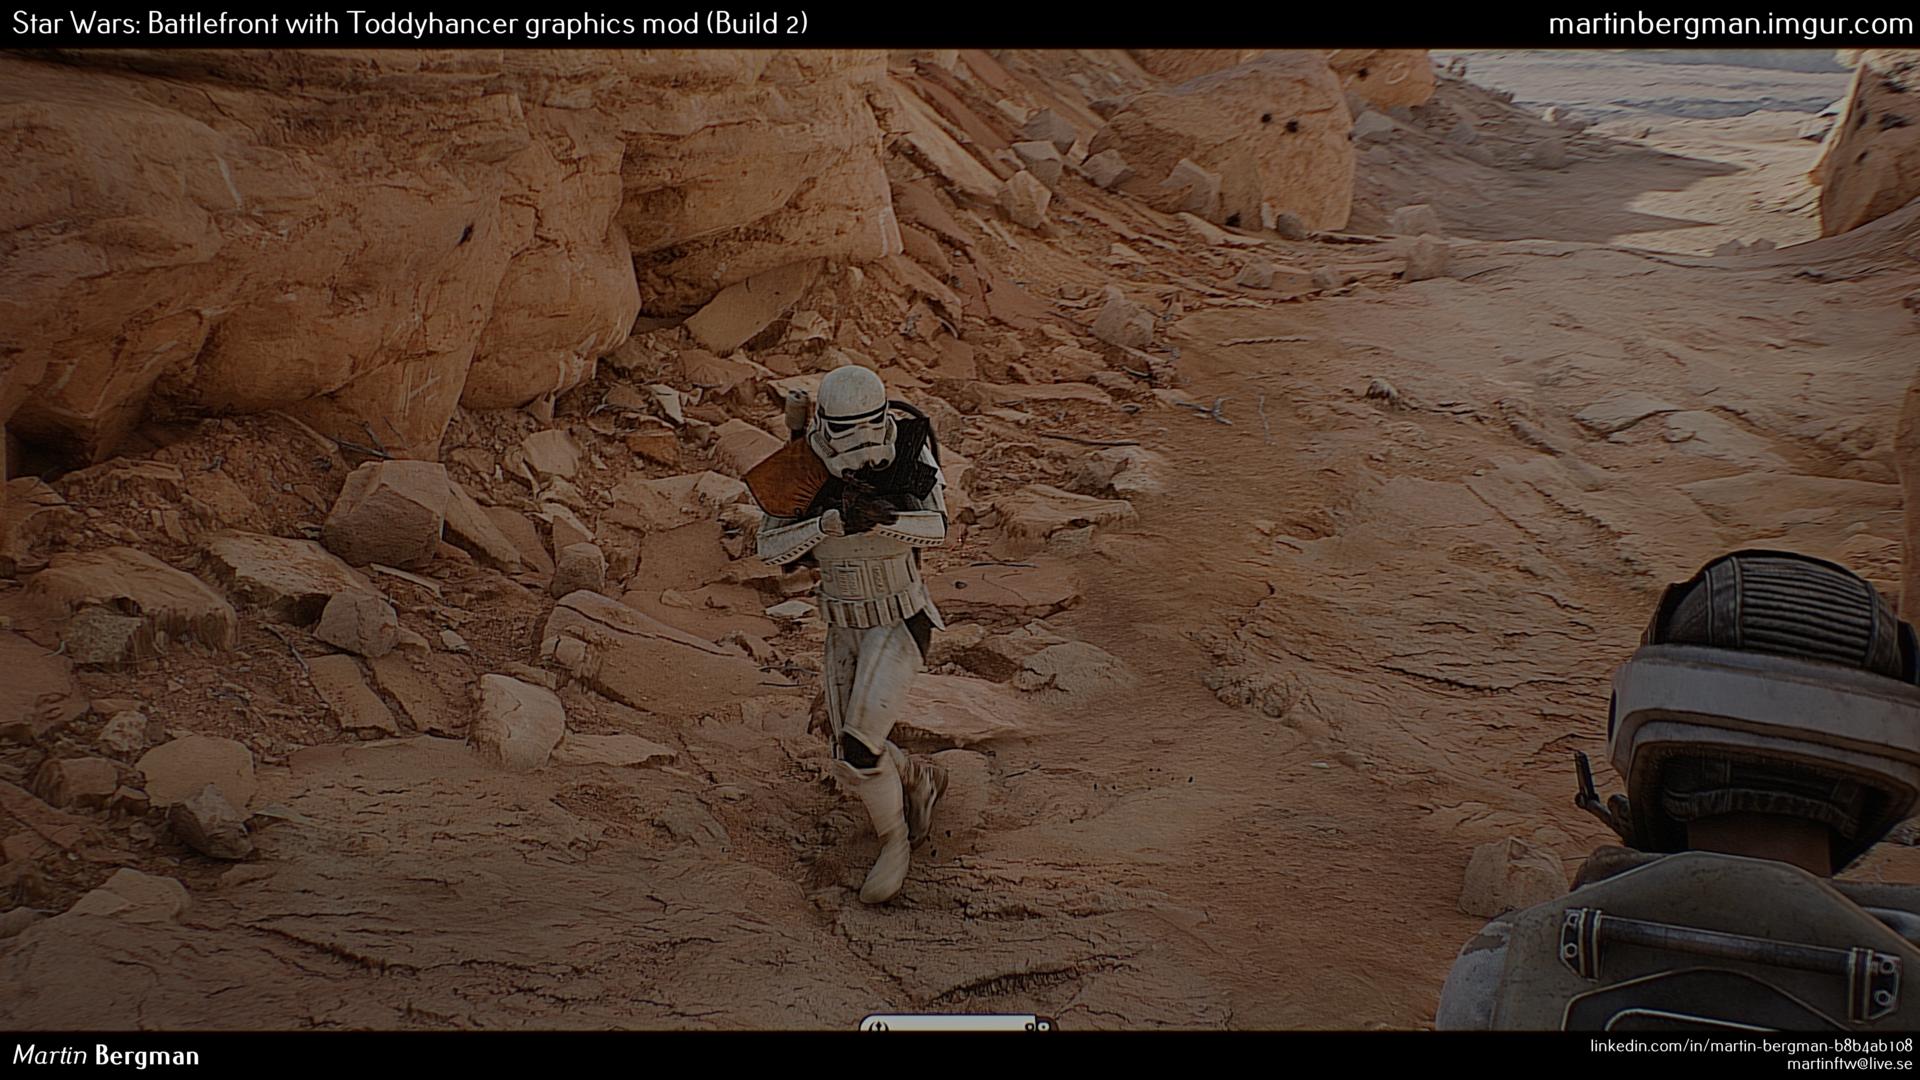 como baixar e instalar star wars battlefront 2